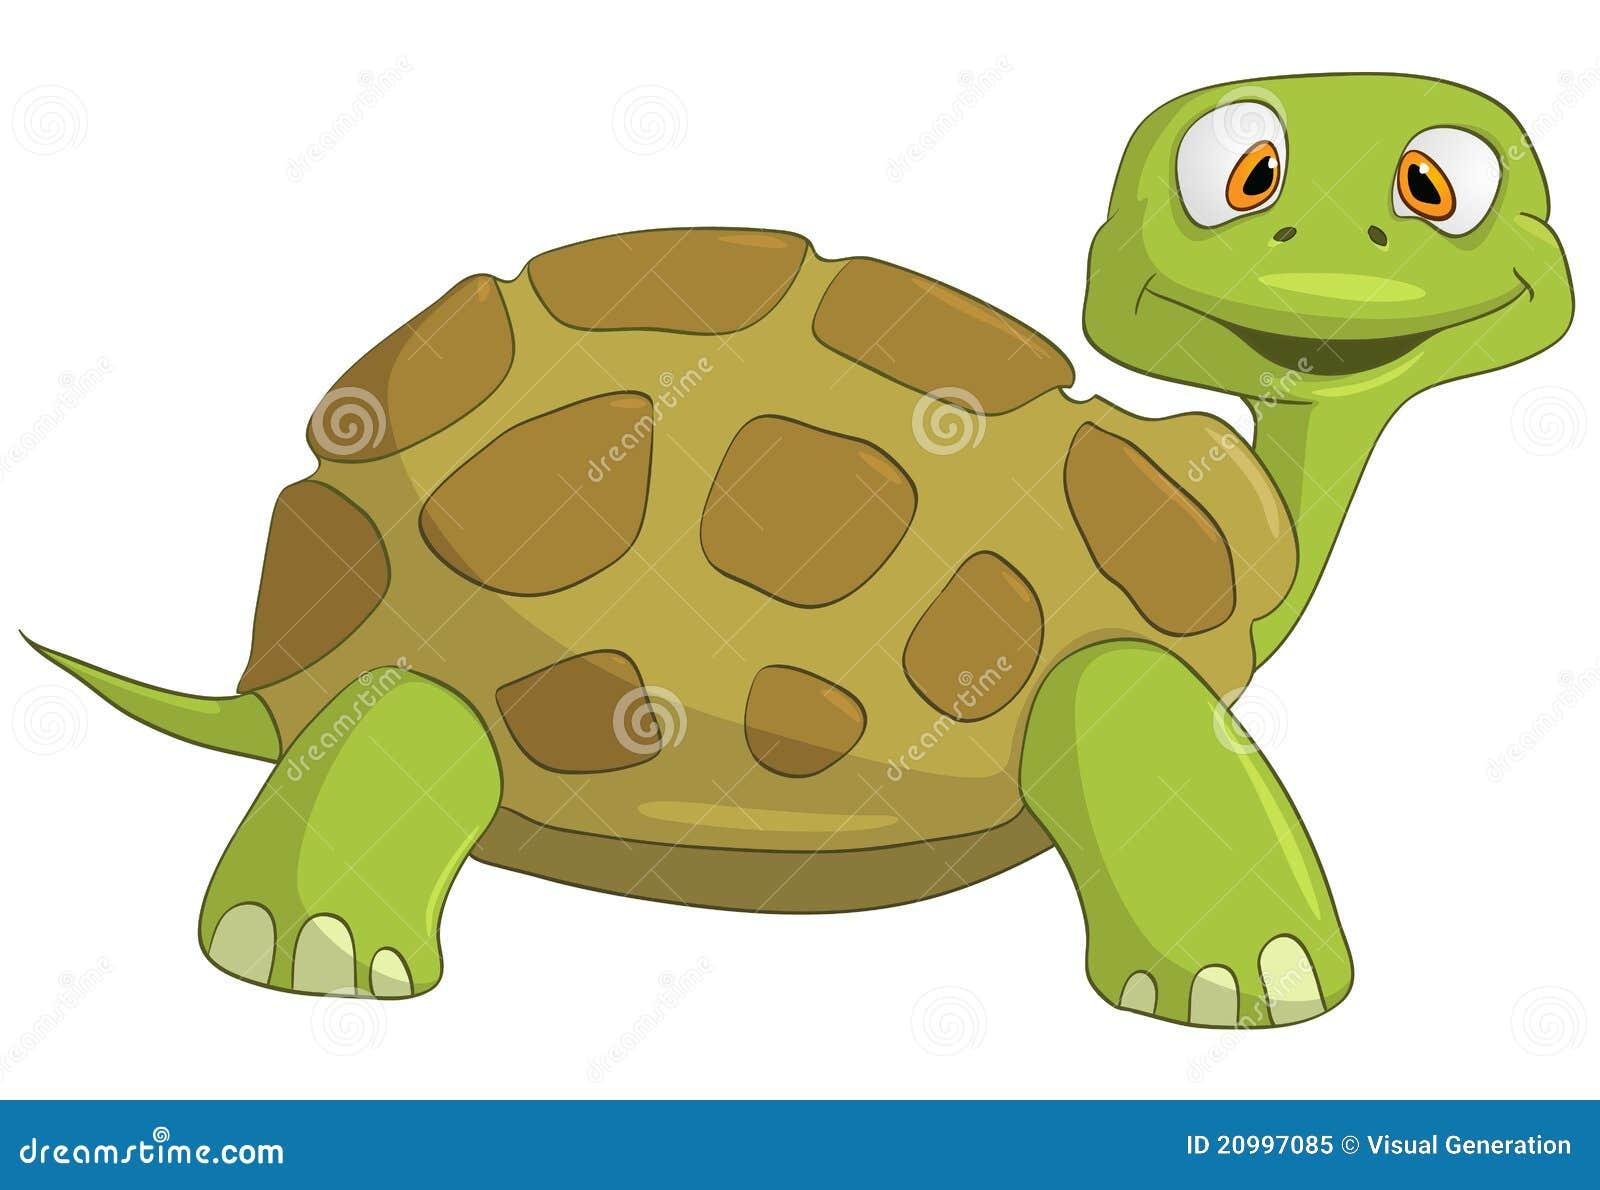 Cartoon Character Turtle Royalty Free Stock Photo - Image: 20997085